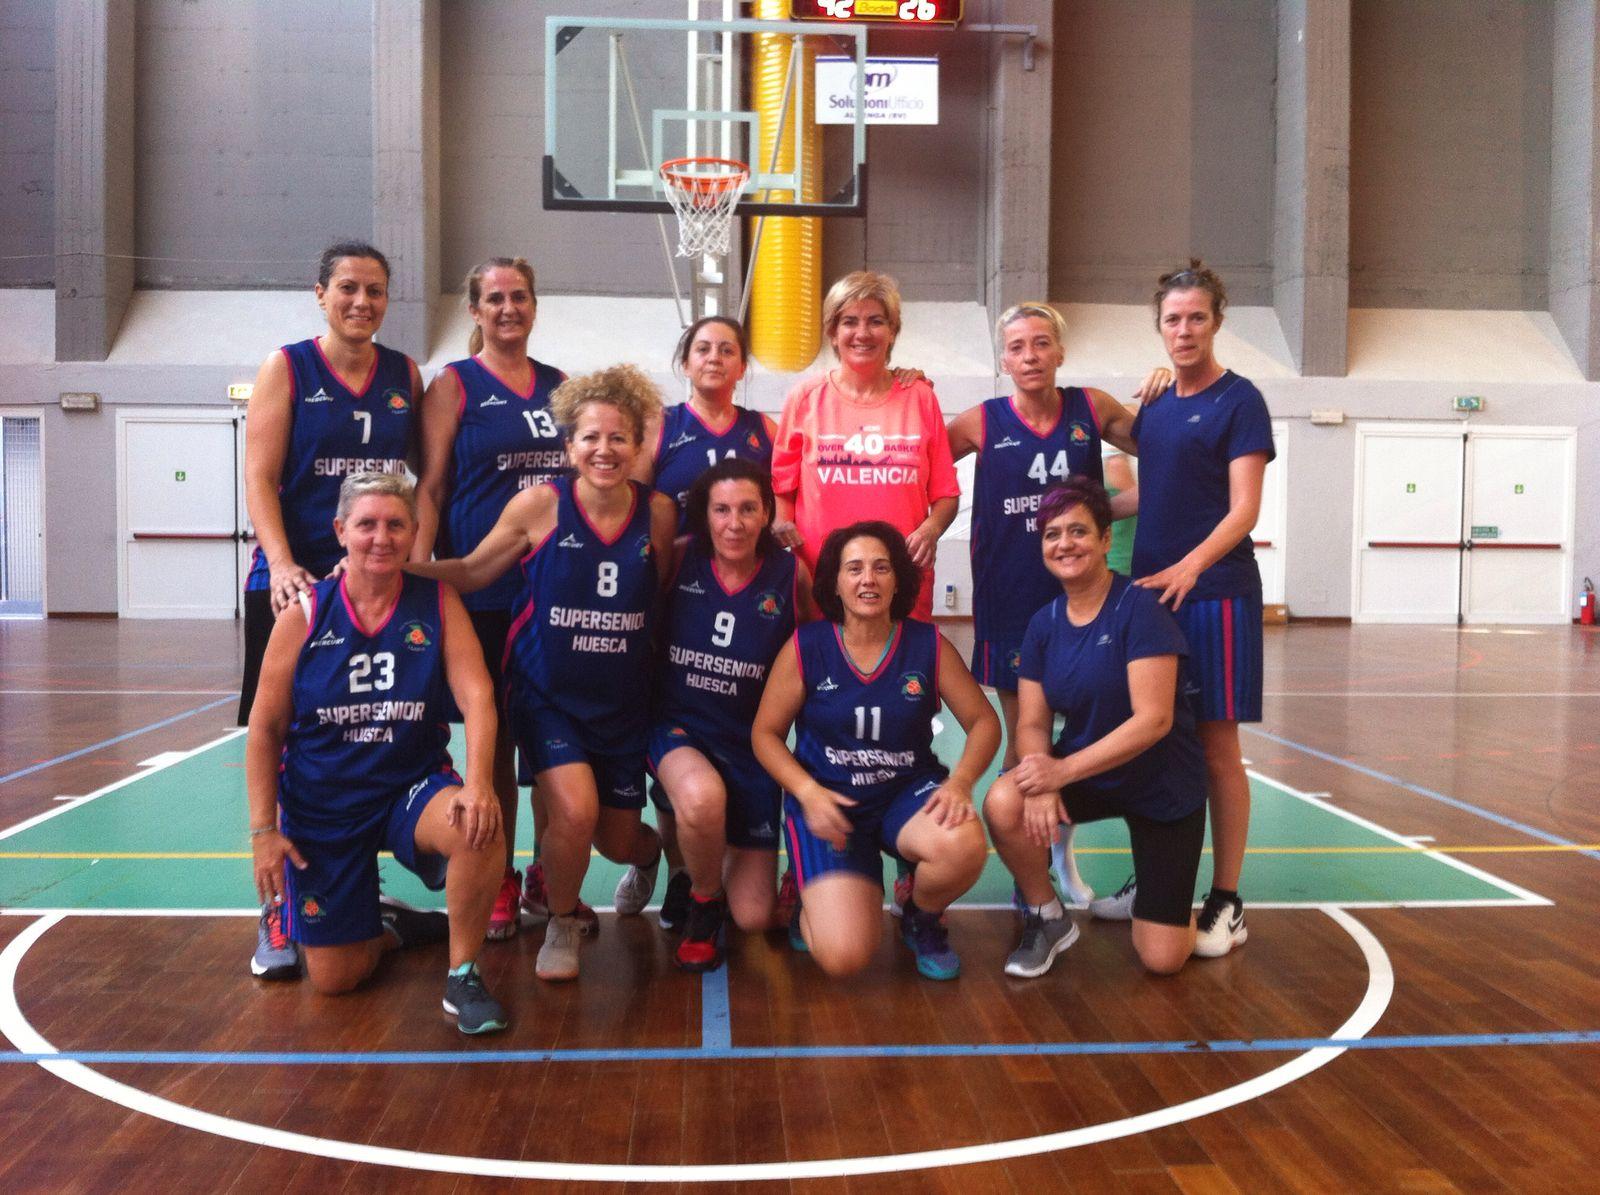 baloncesto femenino super senior